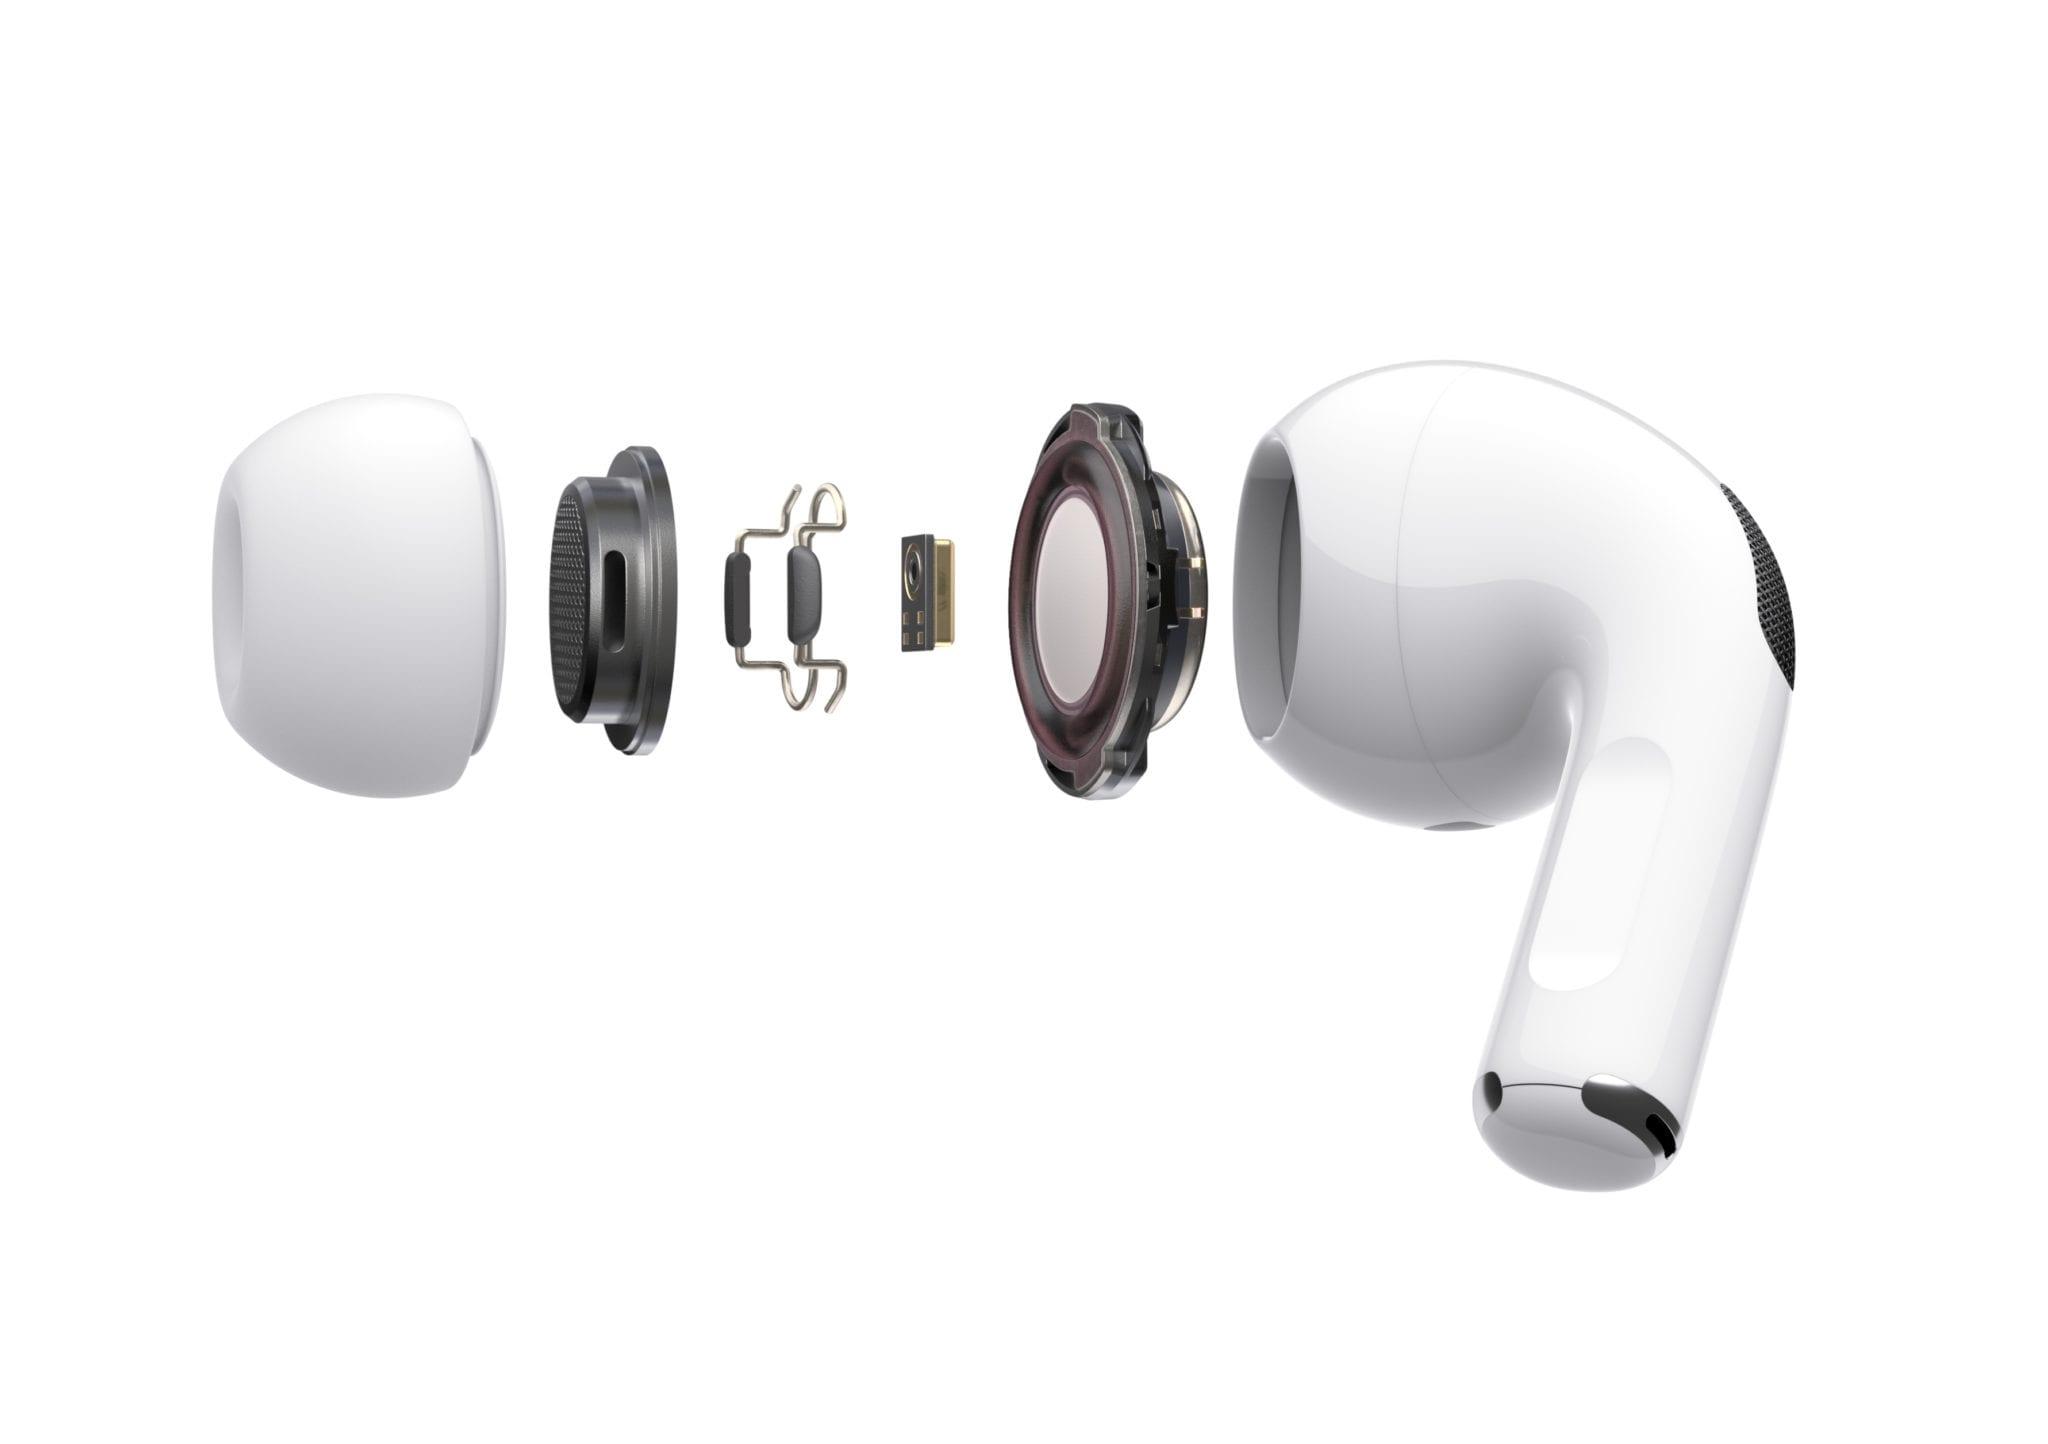 Apple AirPods Pro Expanded 102819 - Apple predstavil AirPods Pro s potláčaním hluku a novou cenovkou